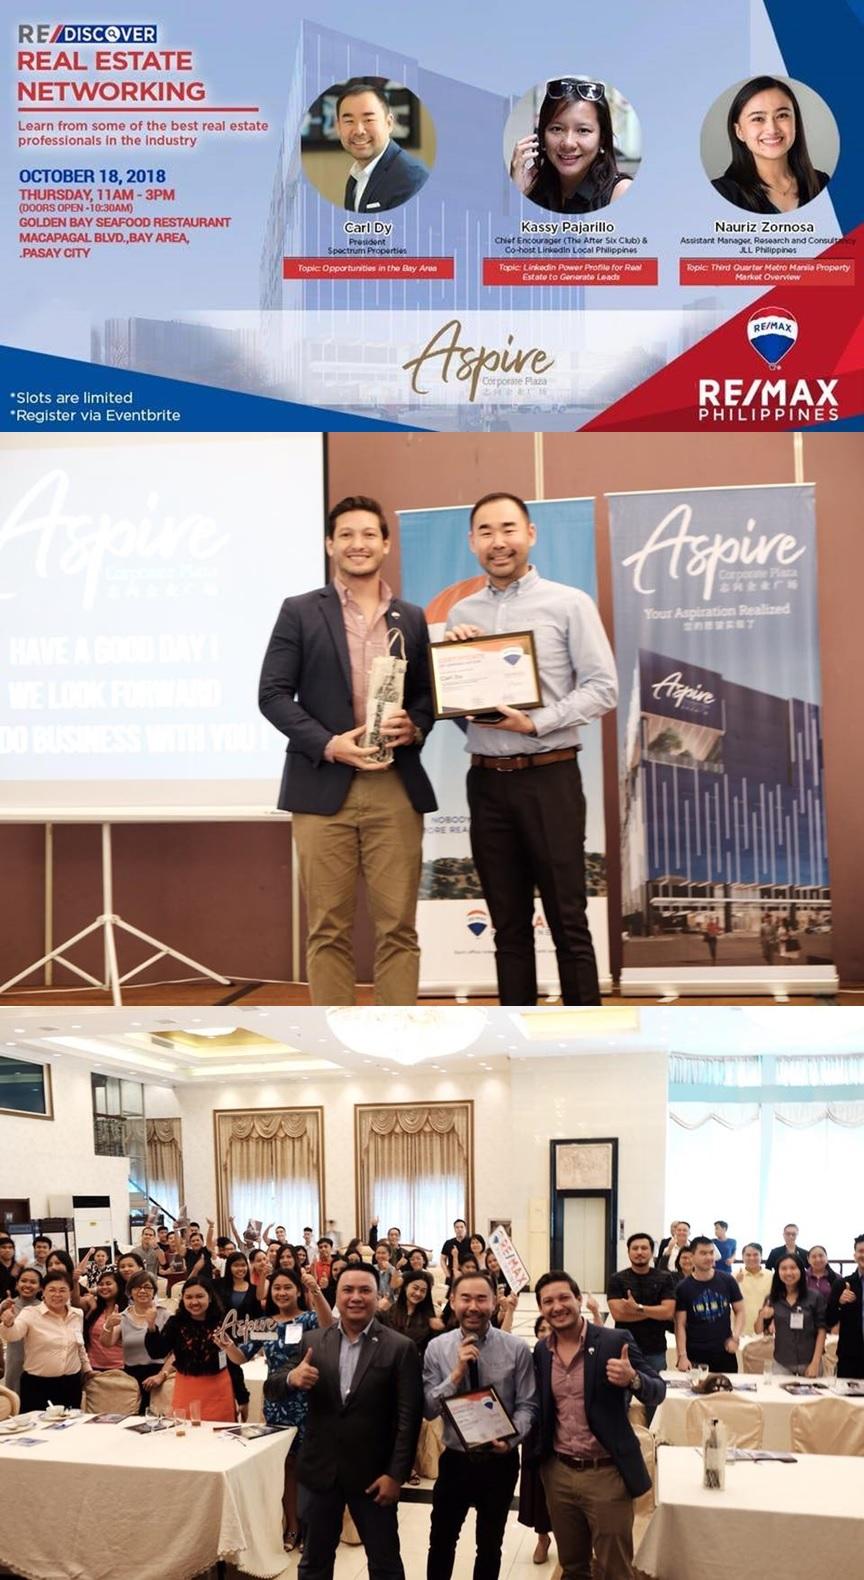 Aspire Real Estate Networking Remax Philippines Property Guru Carl Dy Spectrum Philippines Property Jardin Wong Kassy Pajarillo Nauriz Zornosa.jpg